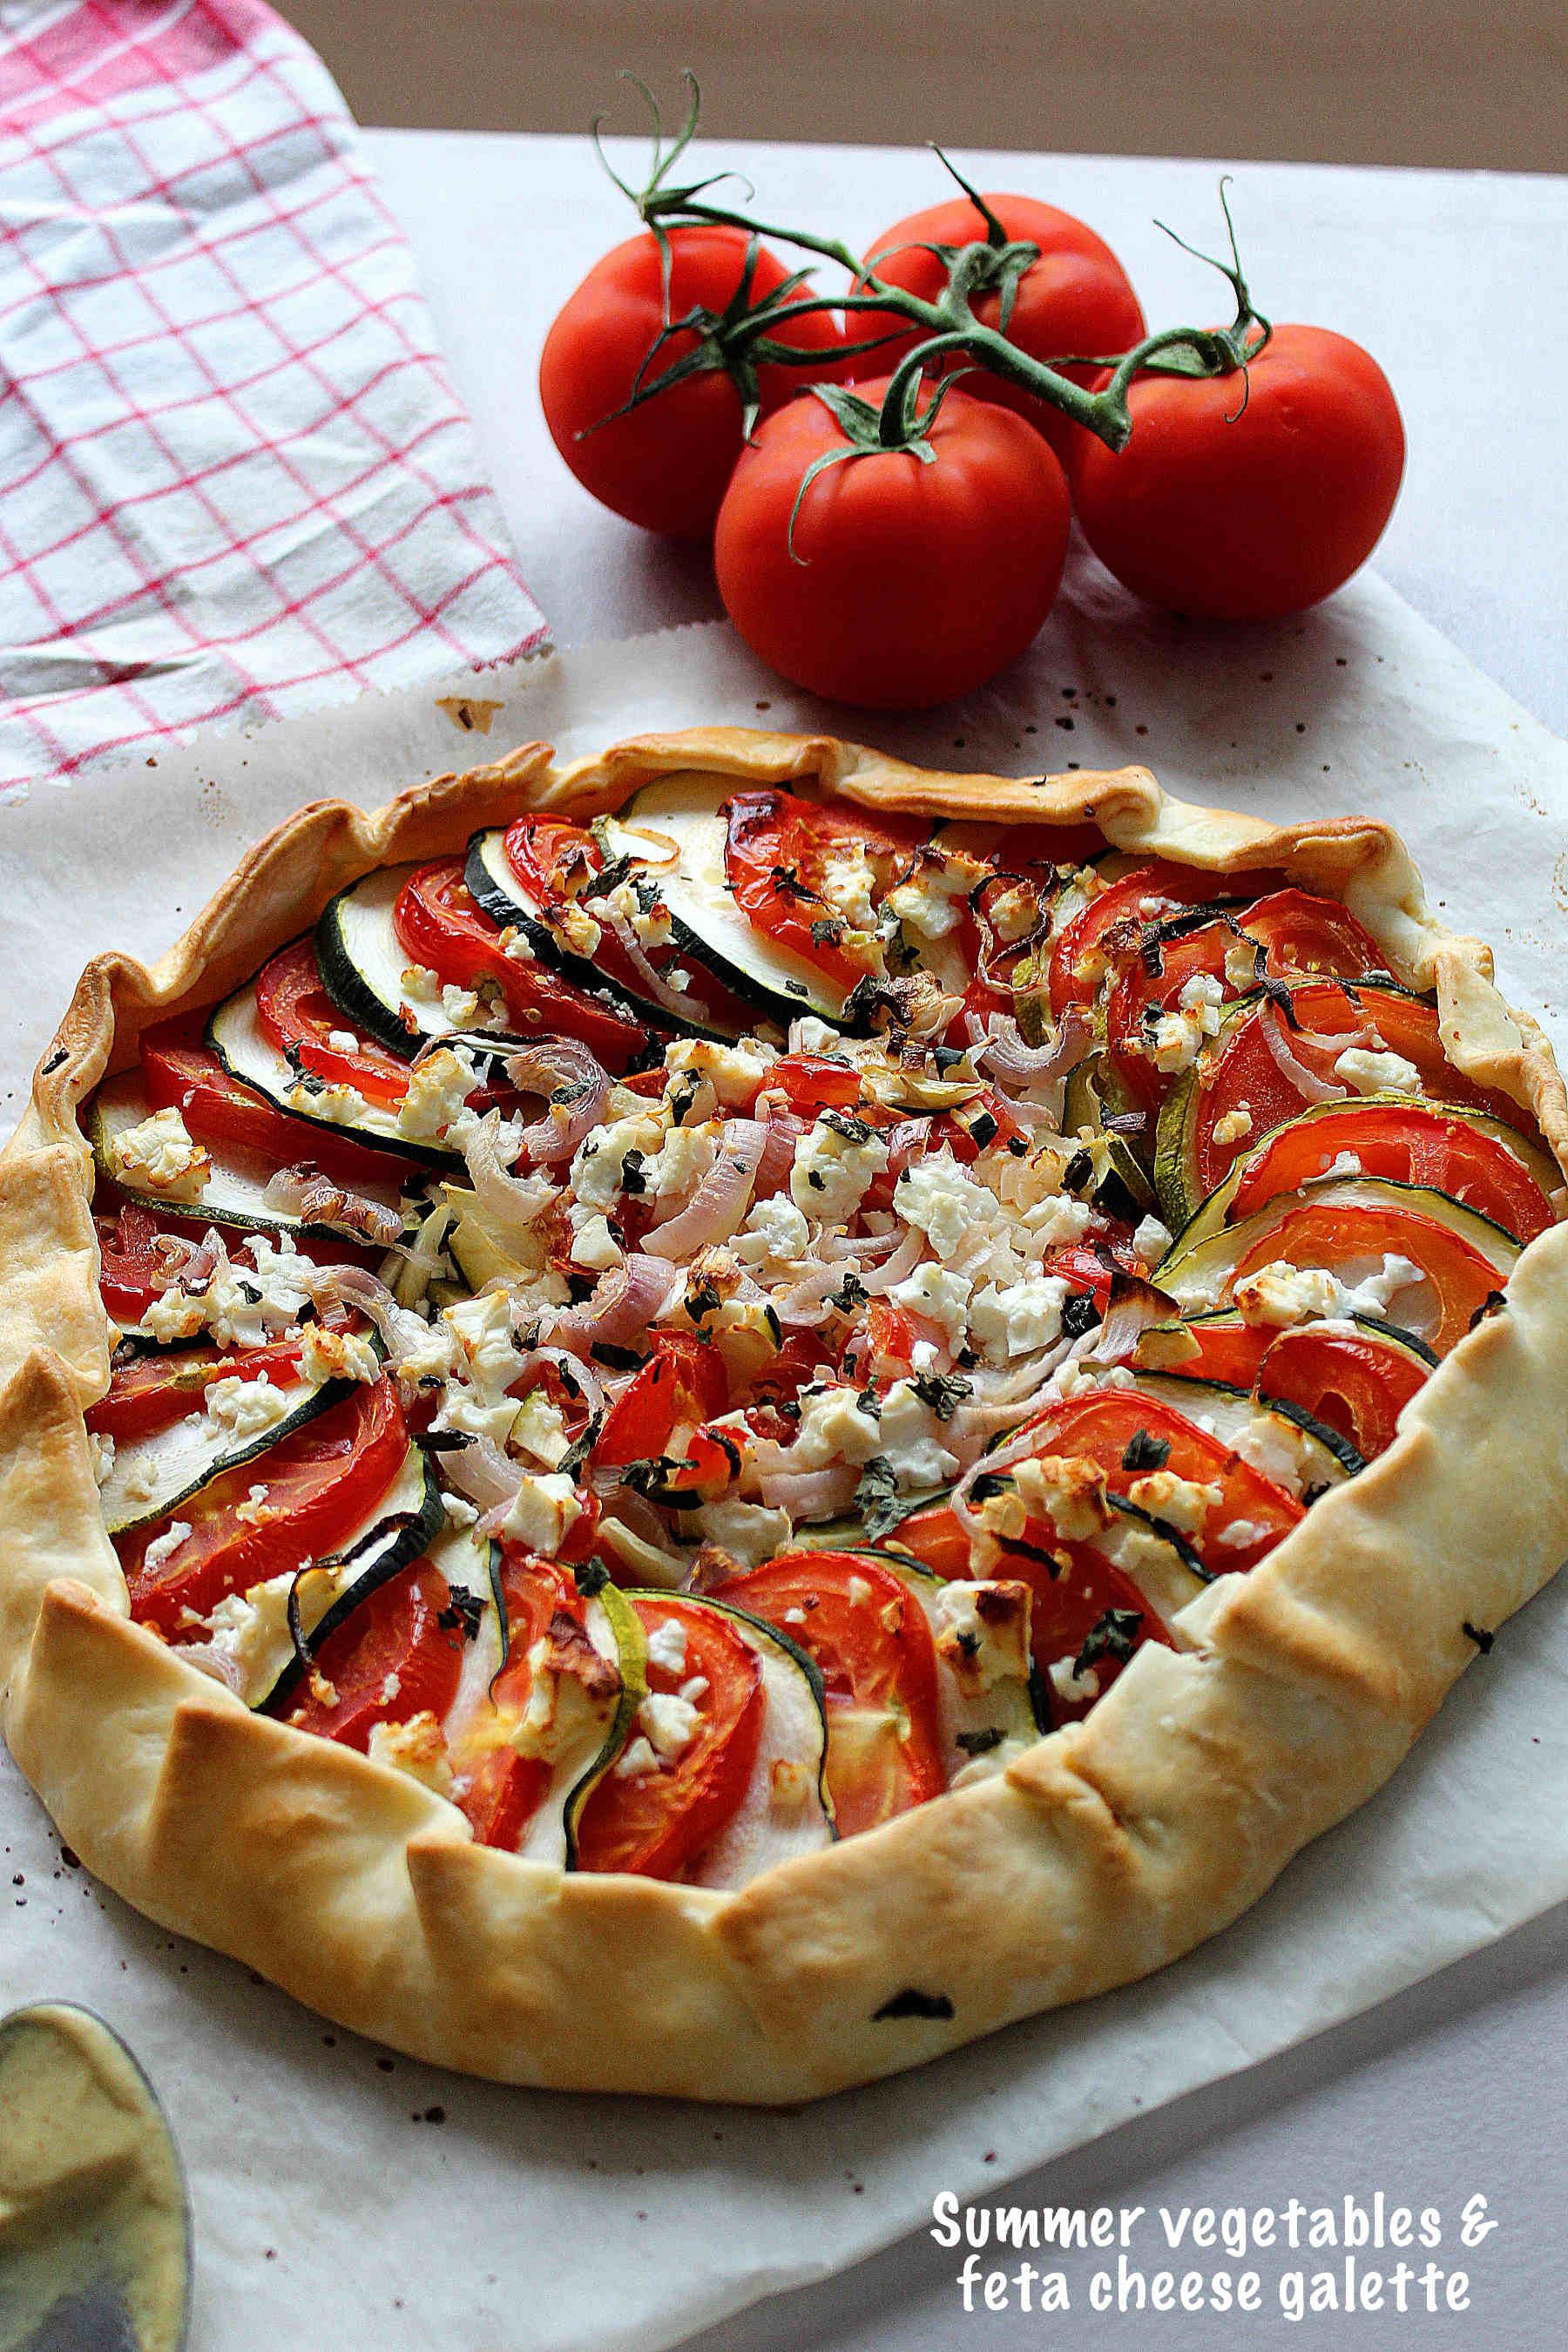 Tarte à la tomate, courgette et féta